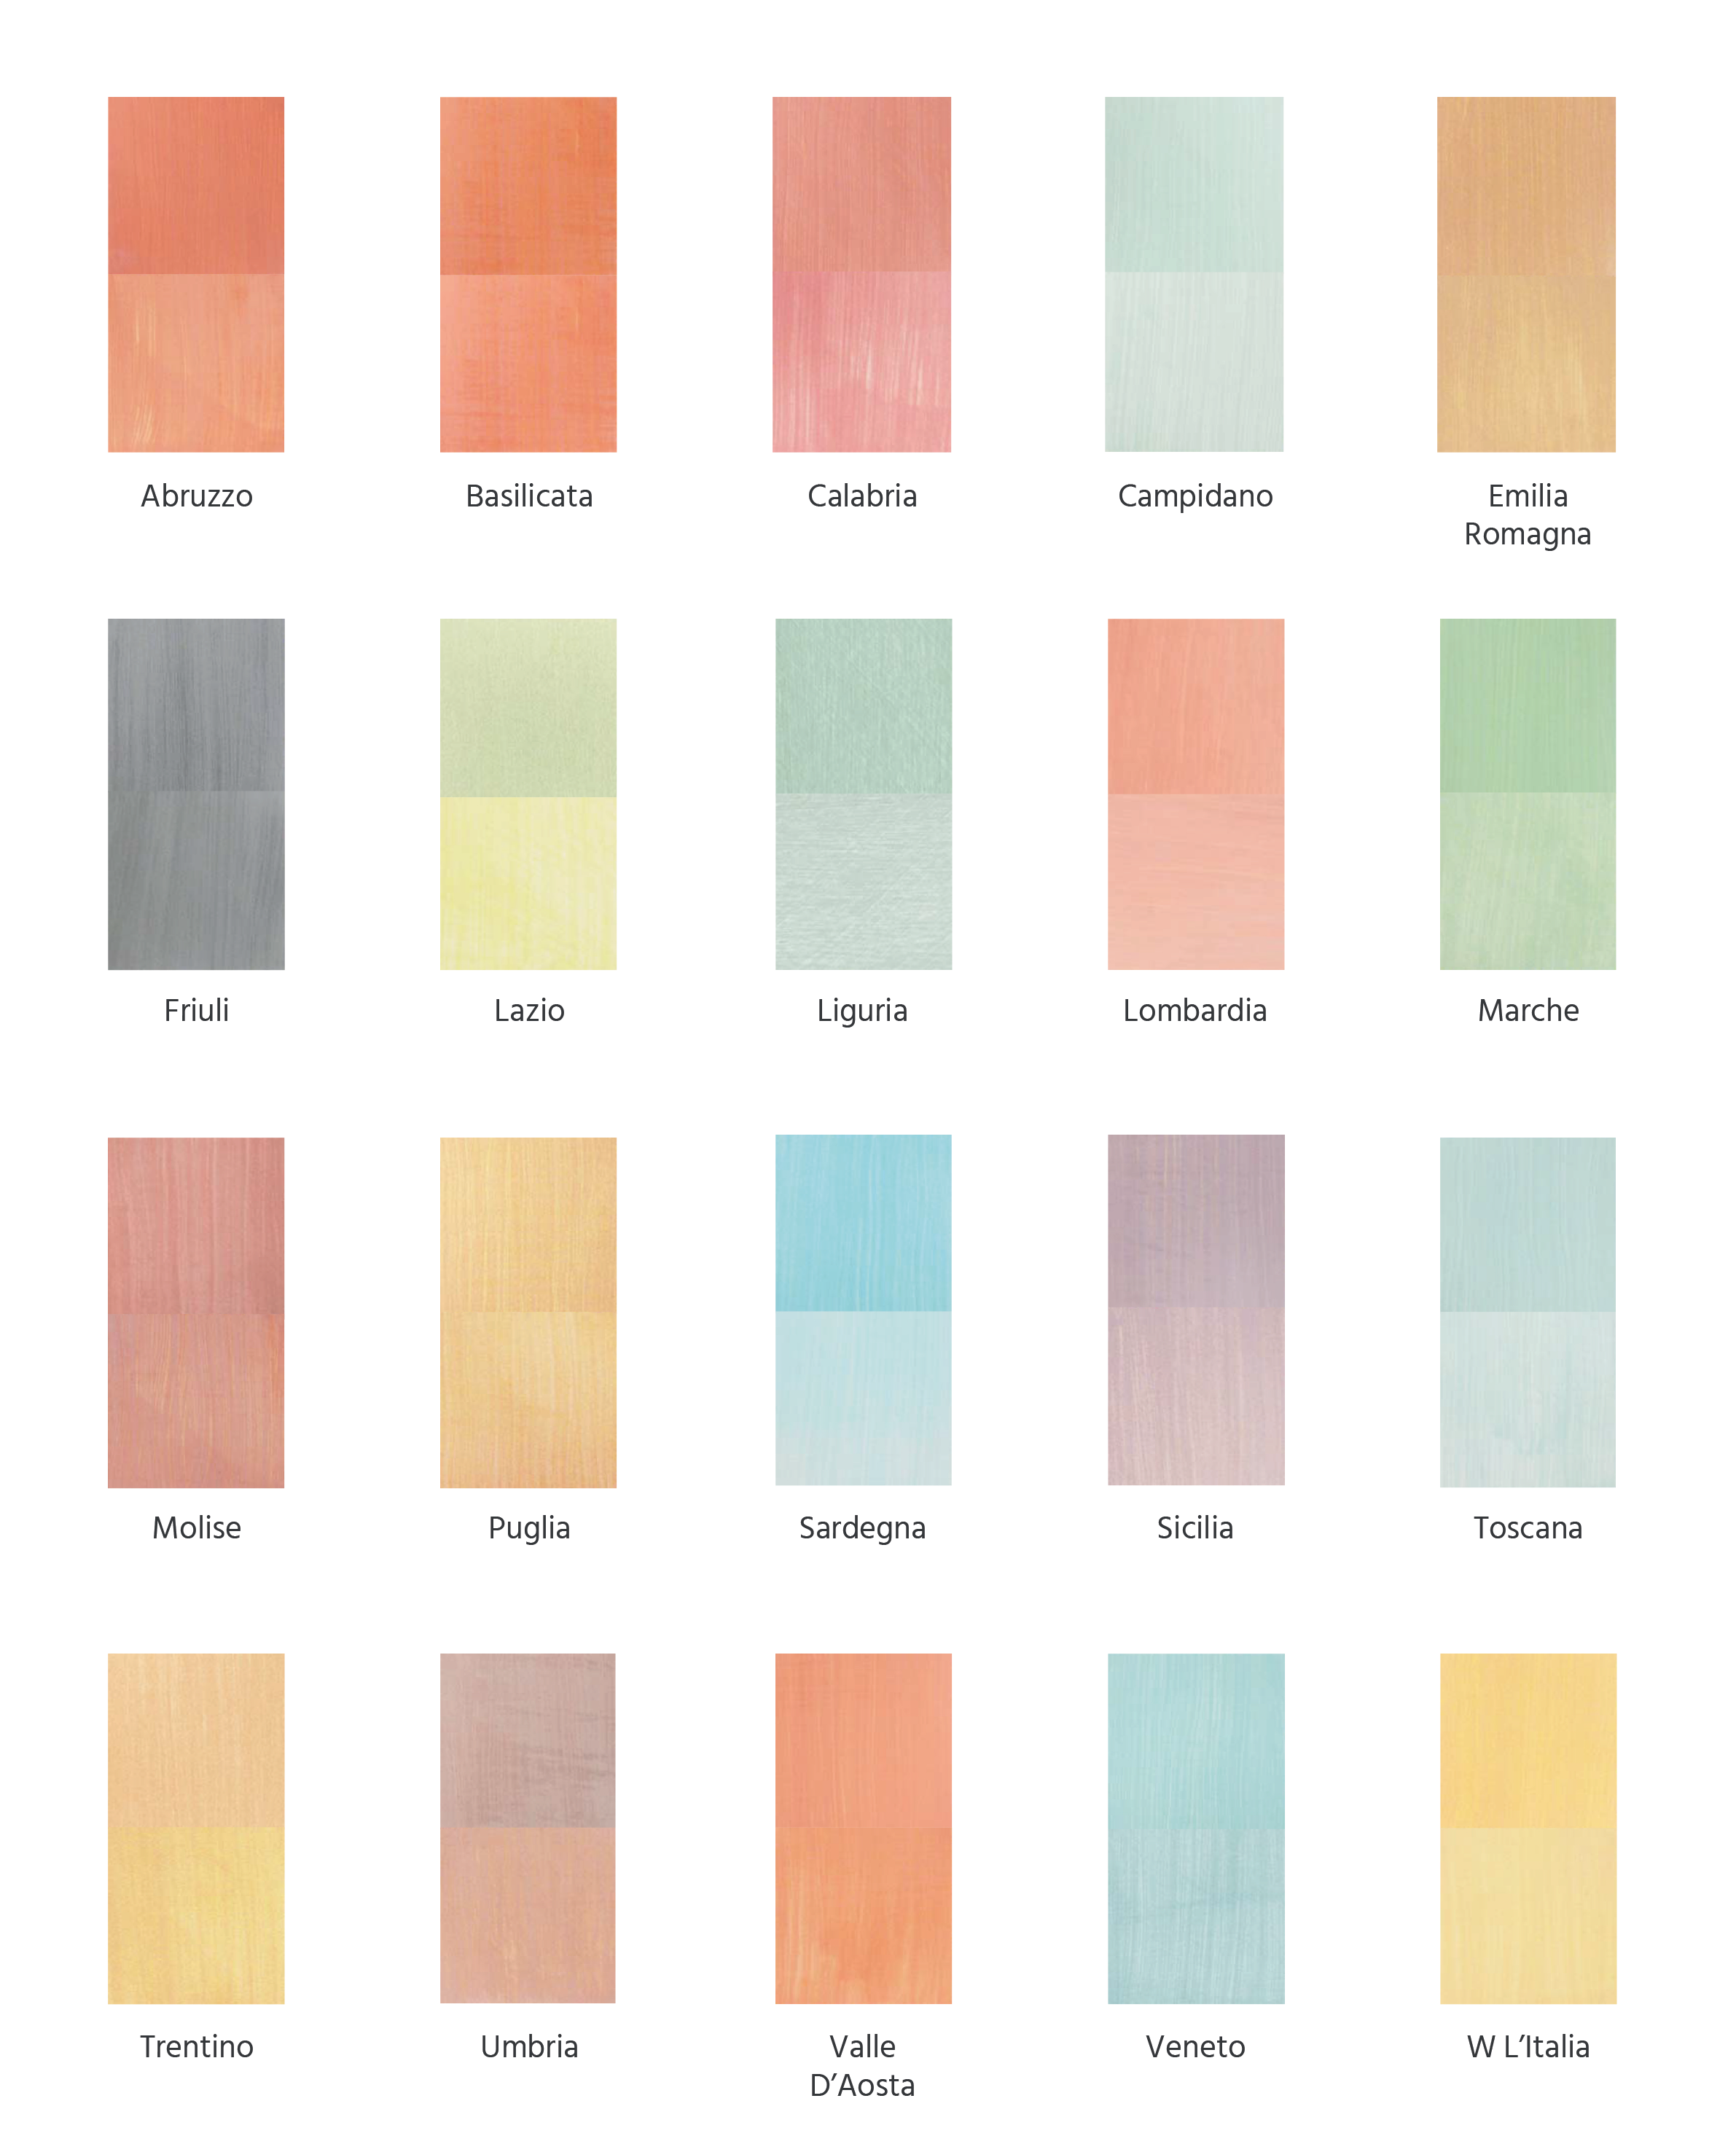 Catalogo Colori Per Pareti edilatte